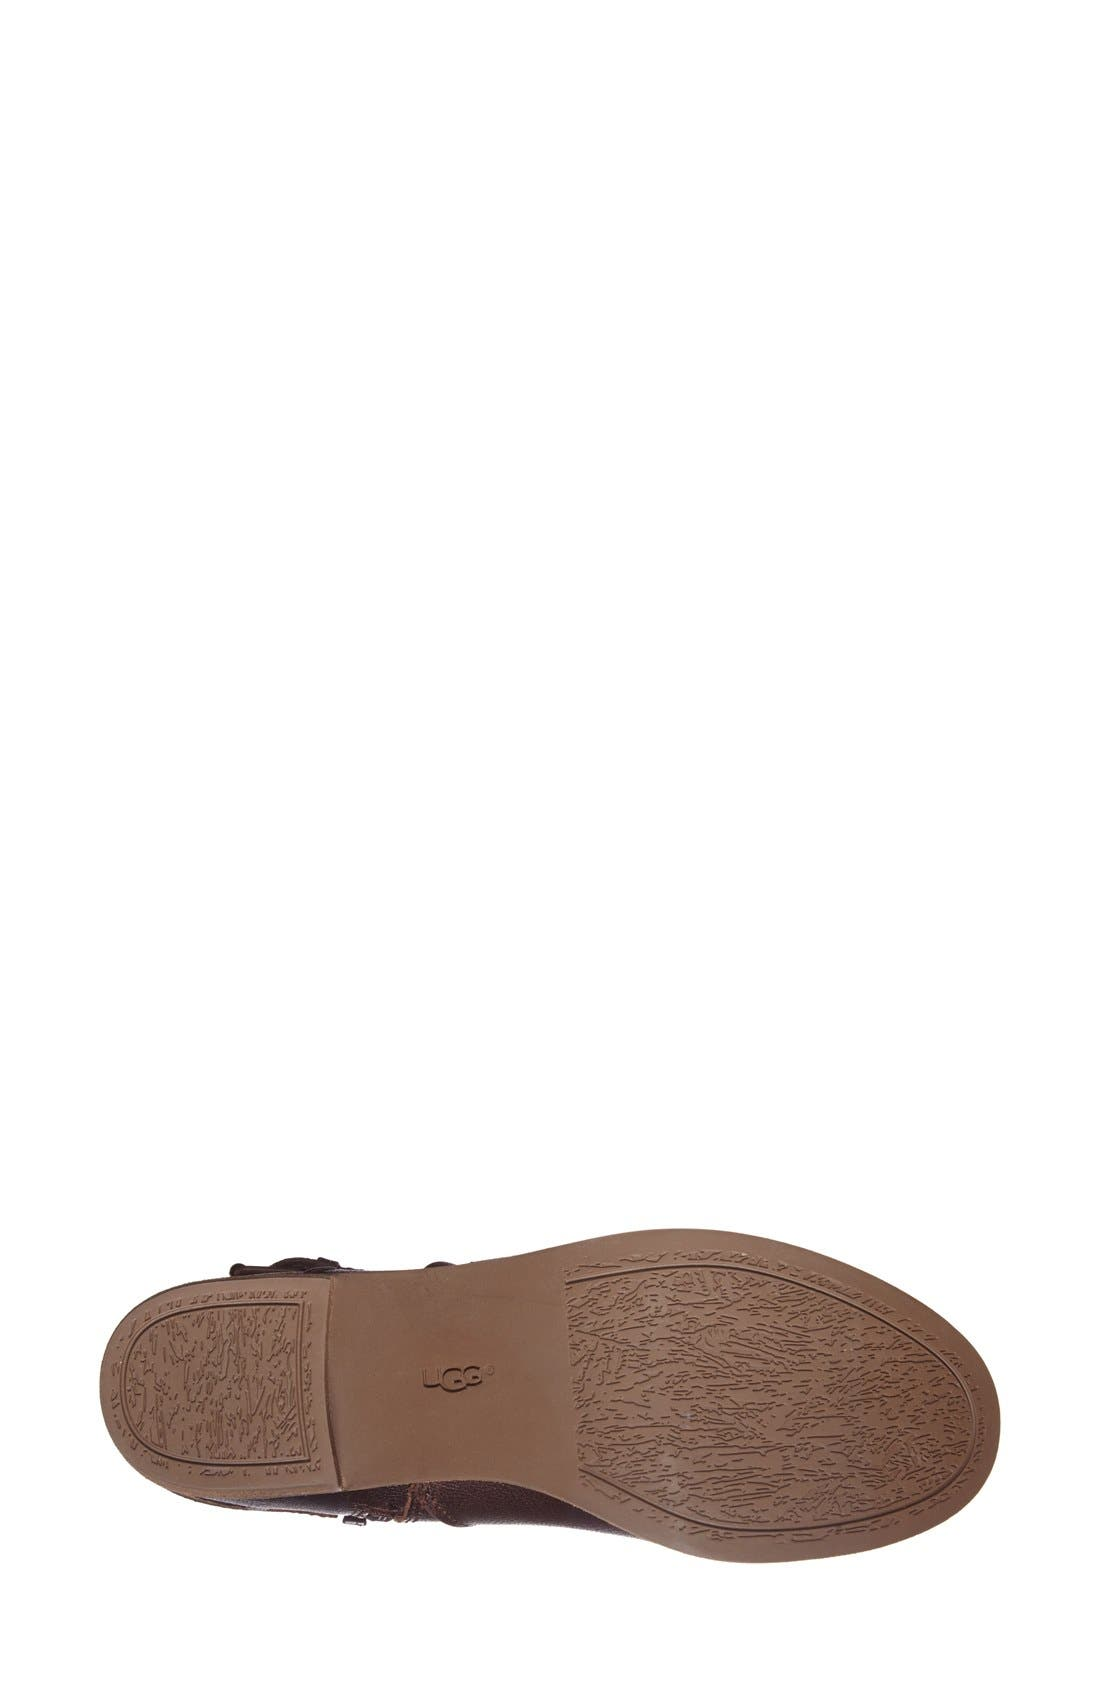 Alternate Image 4  - UGG® Australia 'Volta' Leather Ankle Boot (Women)